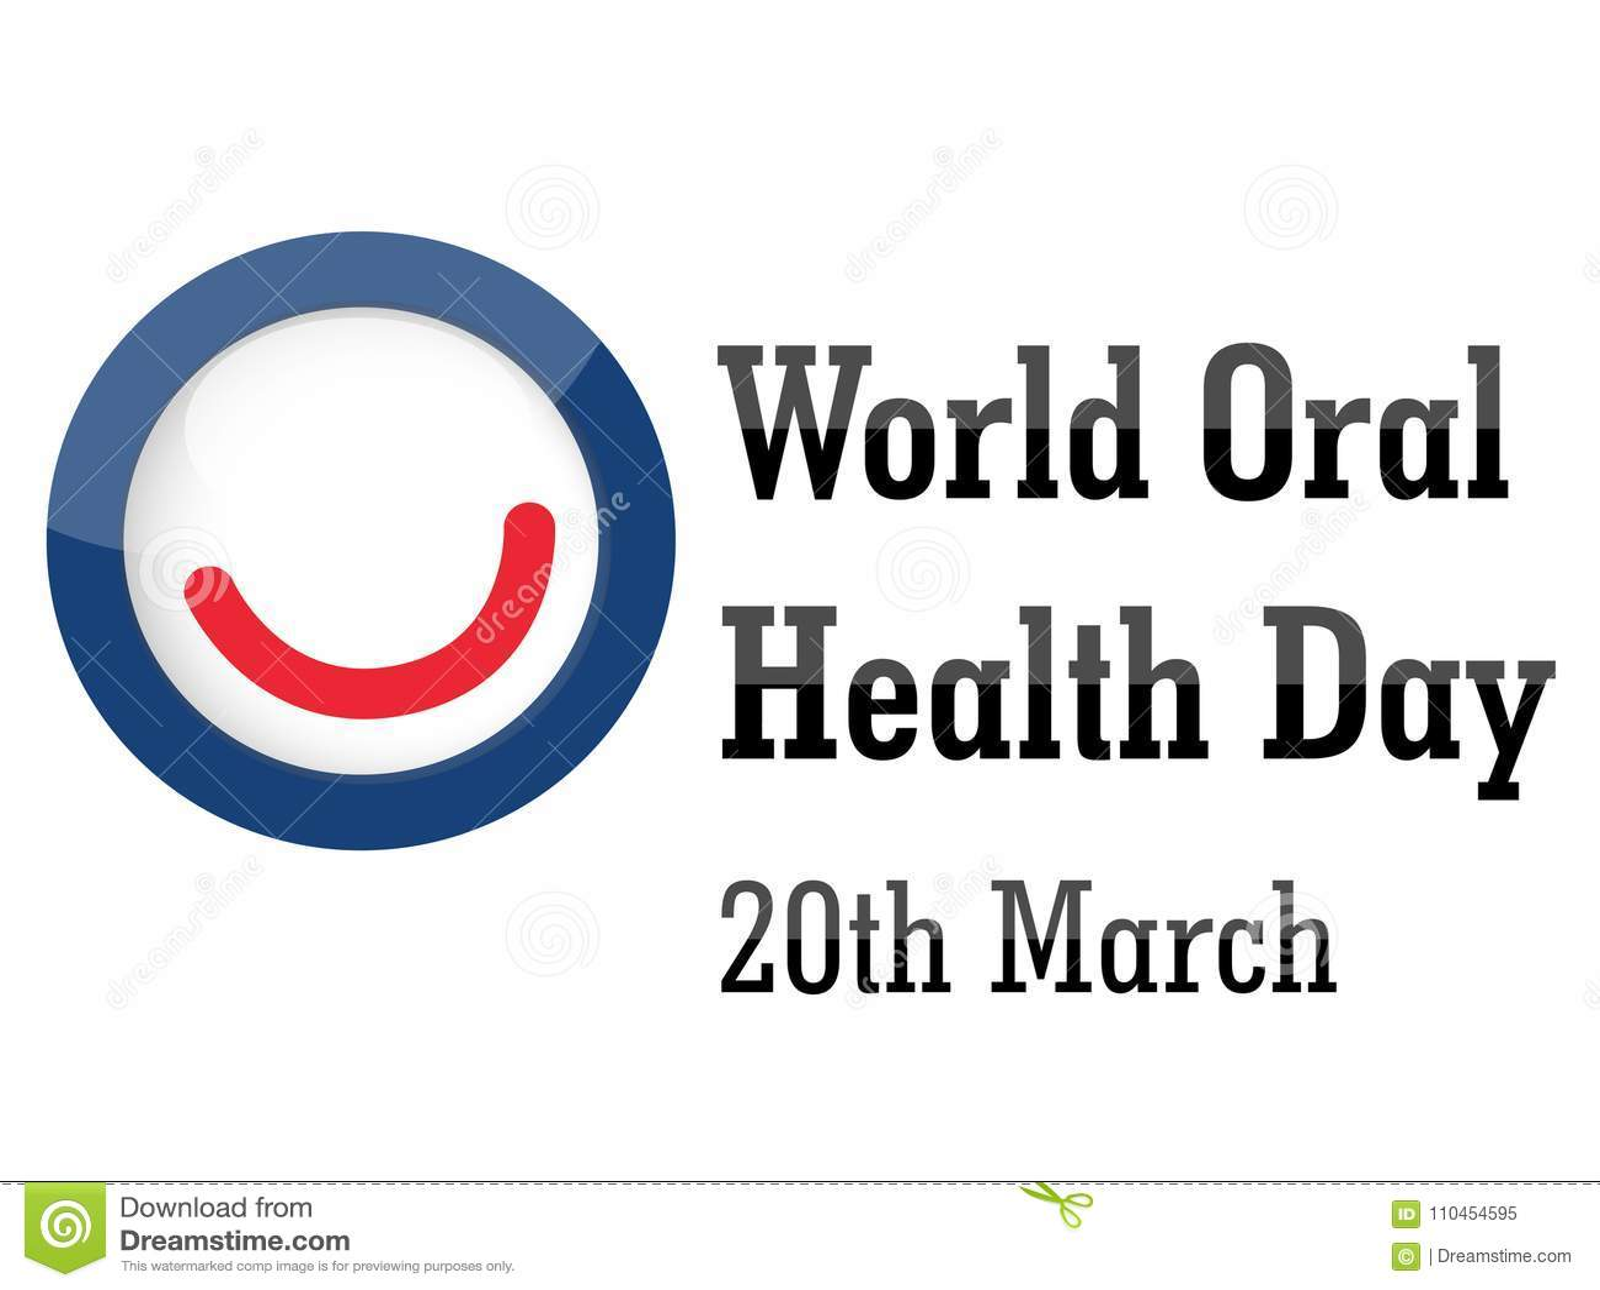 World Oral Health Day Background Stock Illustration ...